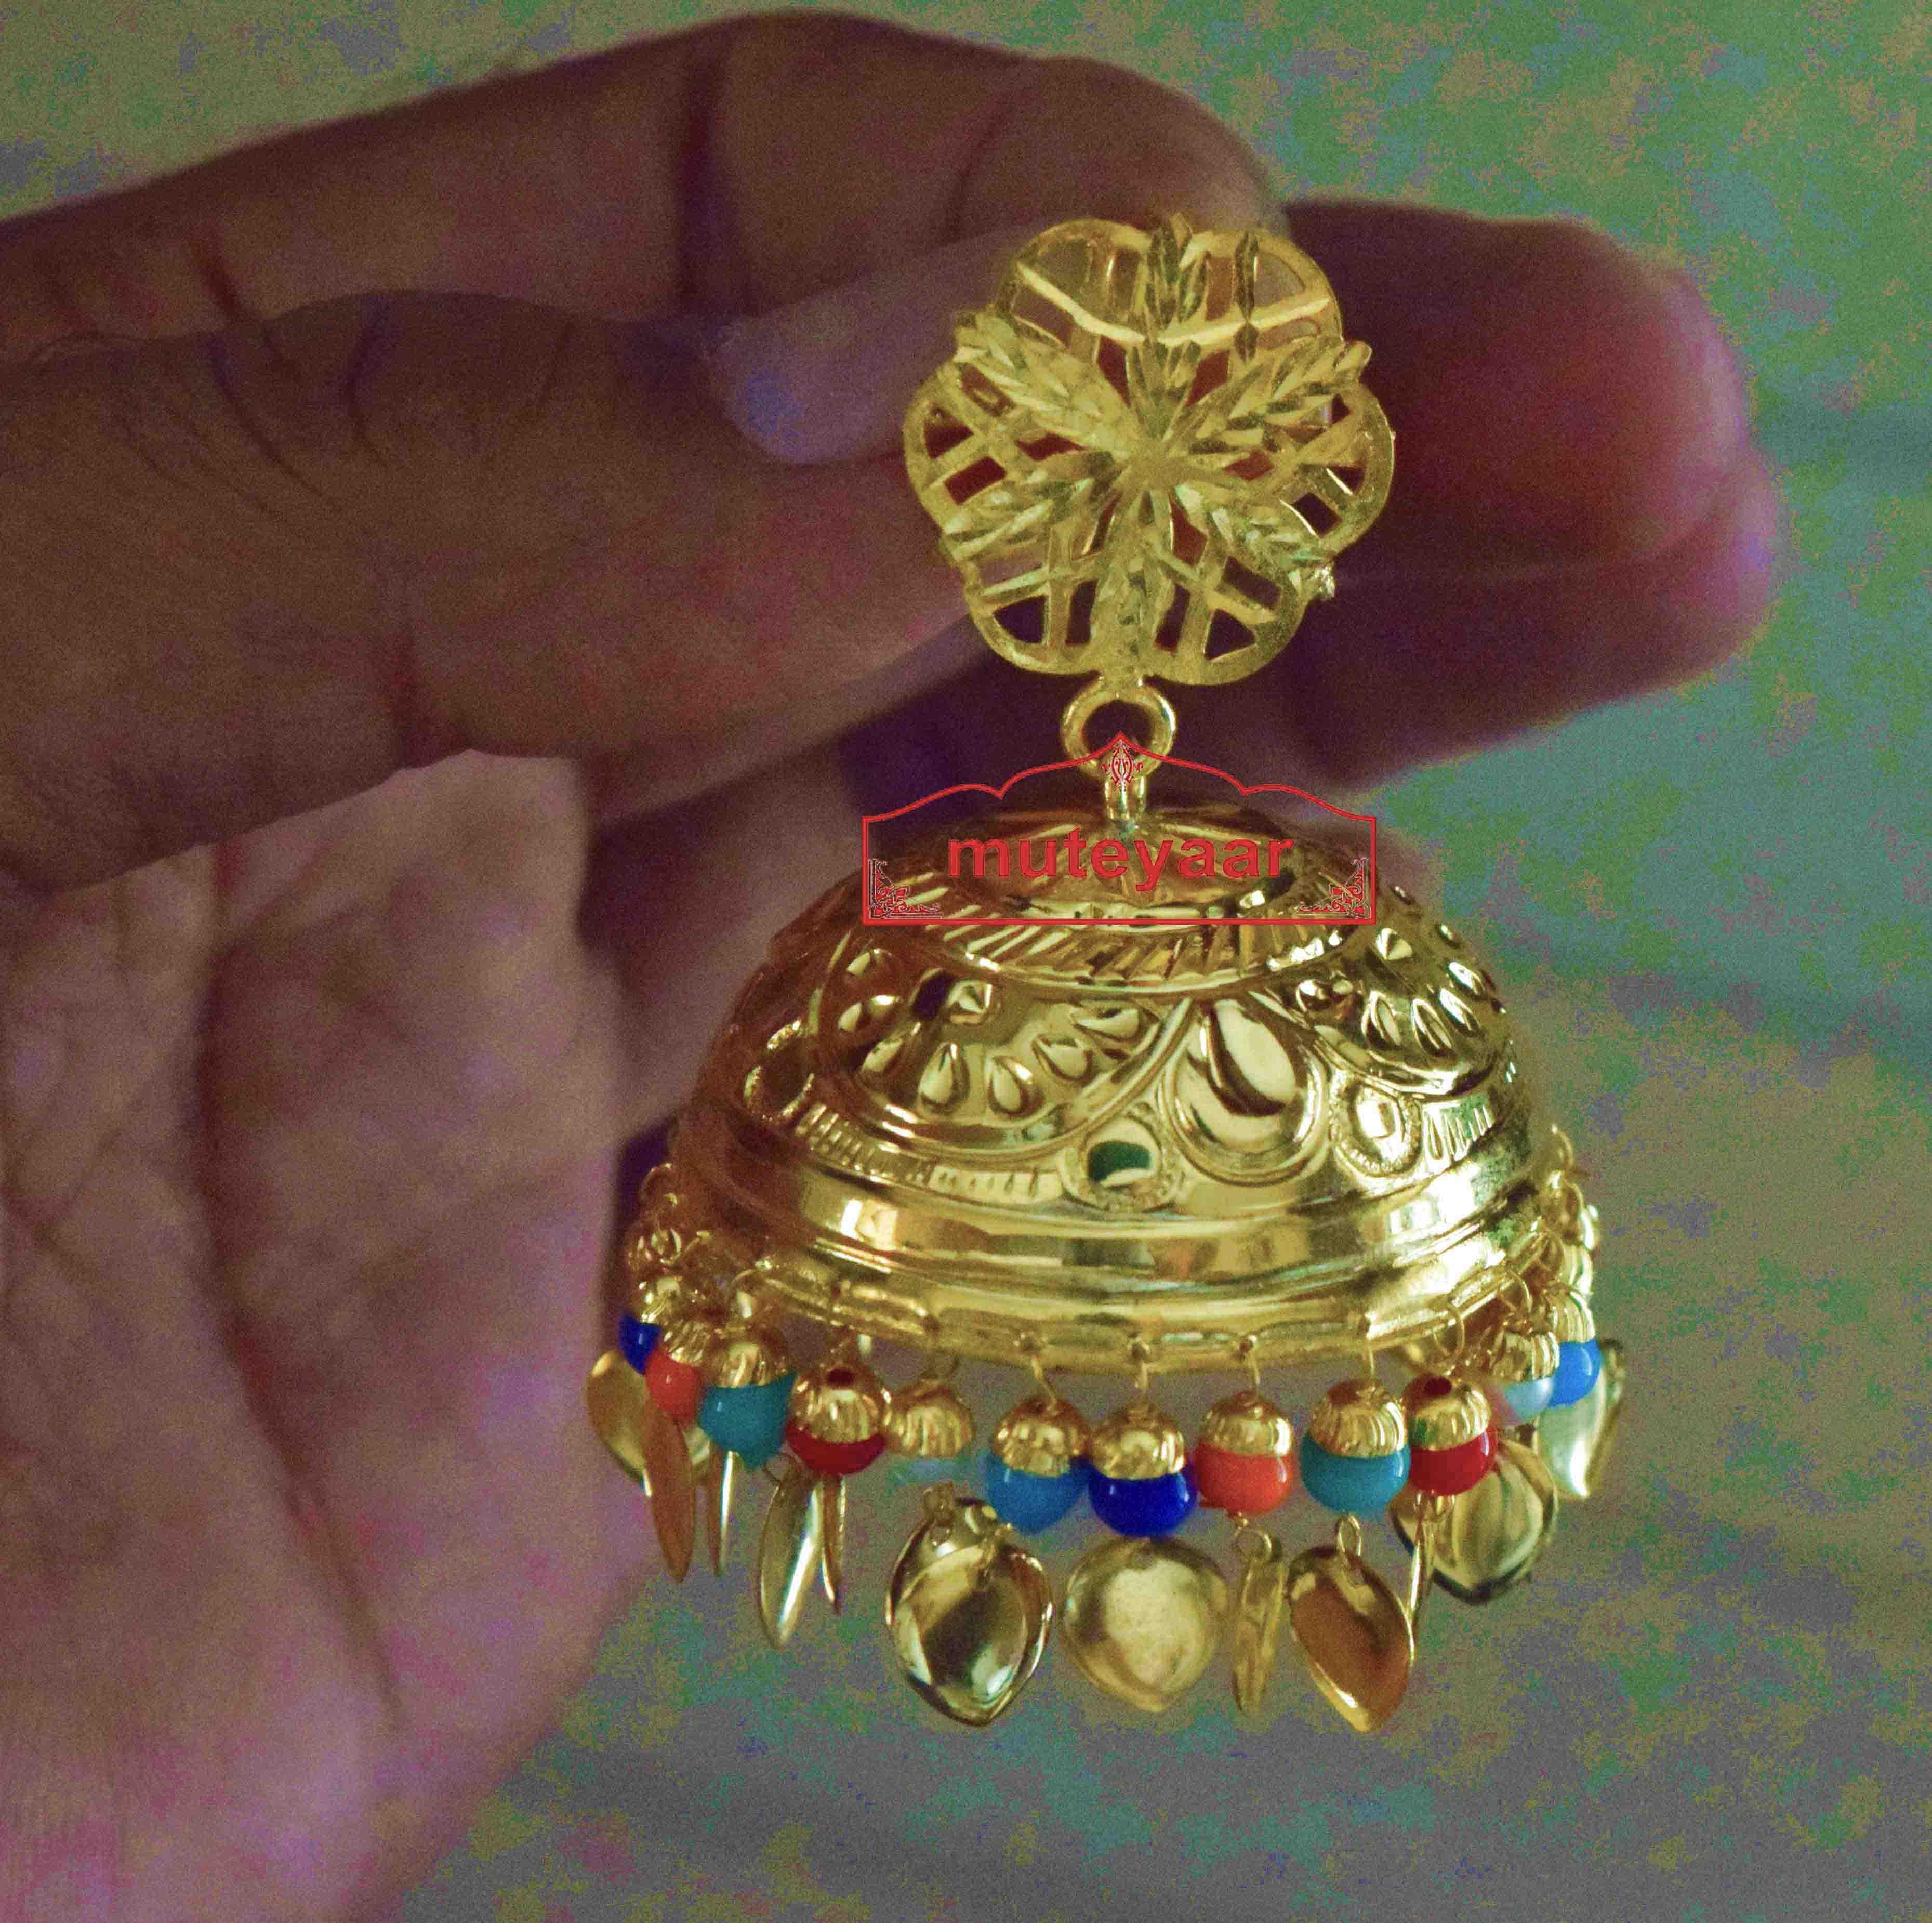 Big LOTAN Earrings Real Gold Plated Traditional Punjabi Jhumka J0386 3